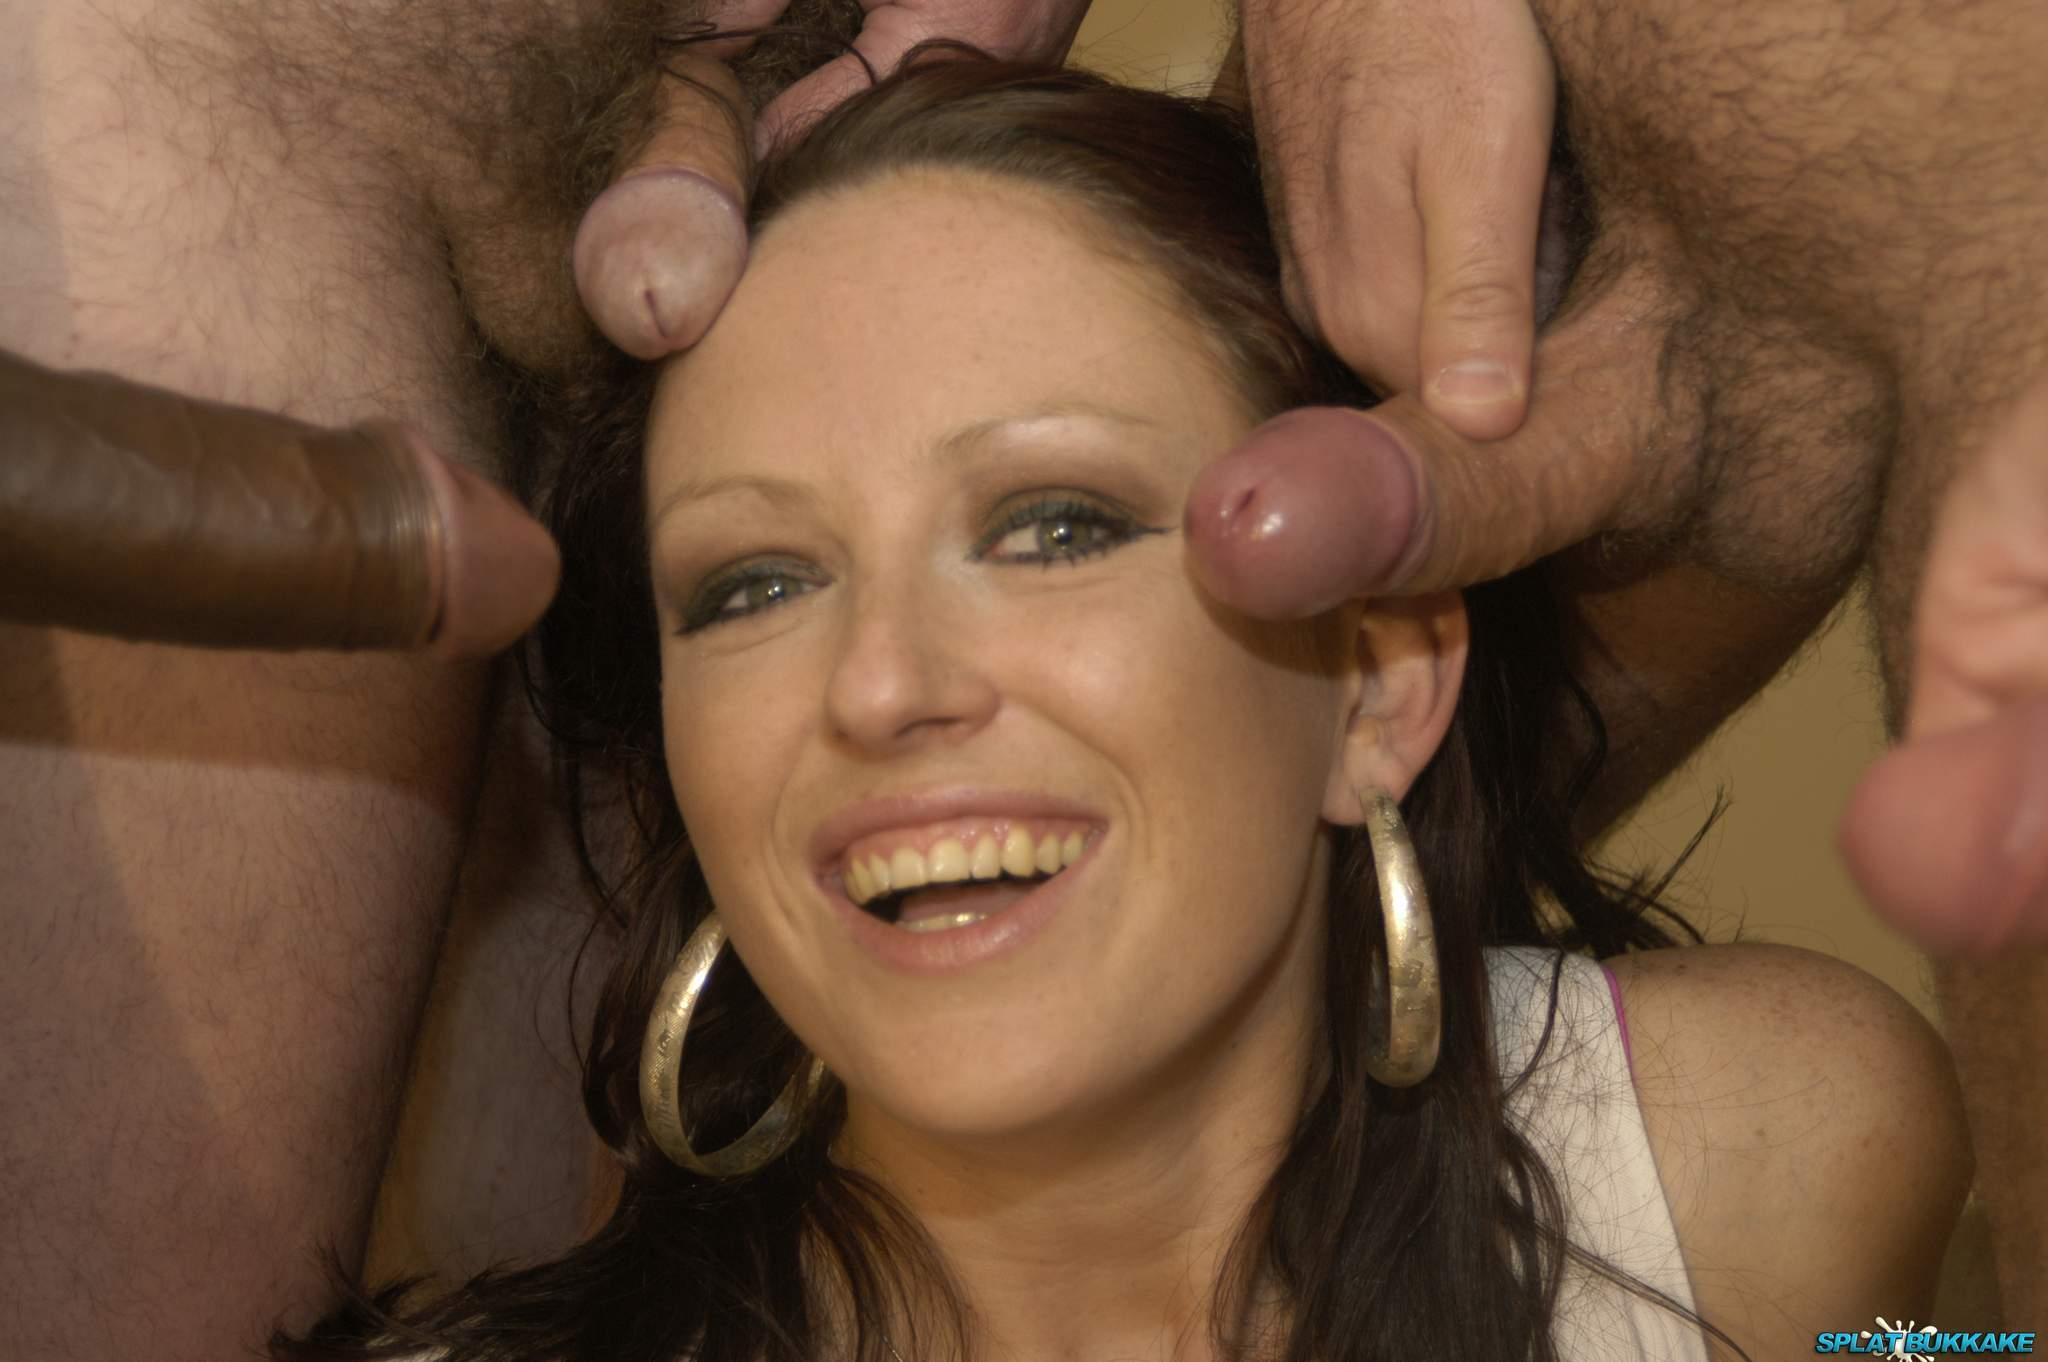 Amateur Bukkake Porn amateur facial bukkake shoot for british babe roxy roxx